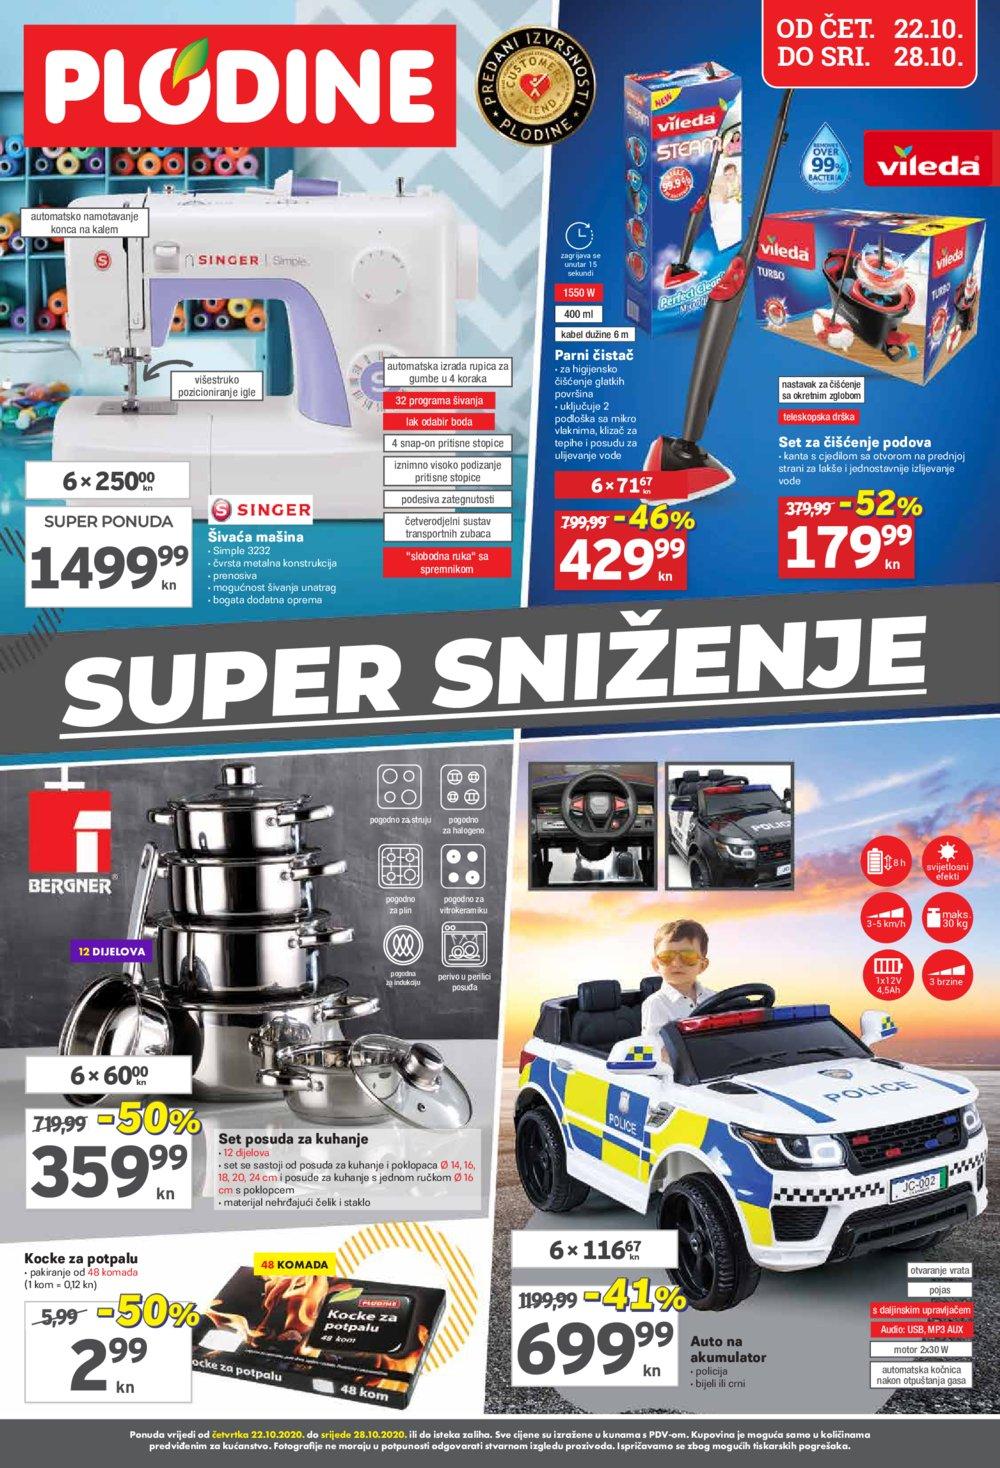 Plodine katalog Super sniženje 22.10.-28.10.2020.